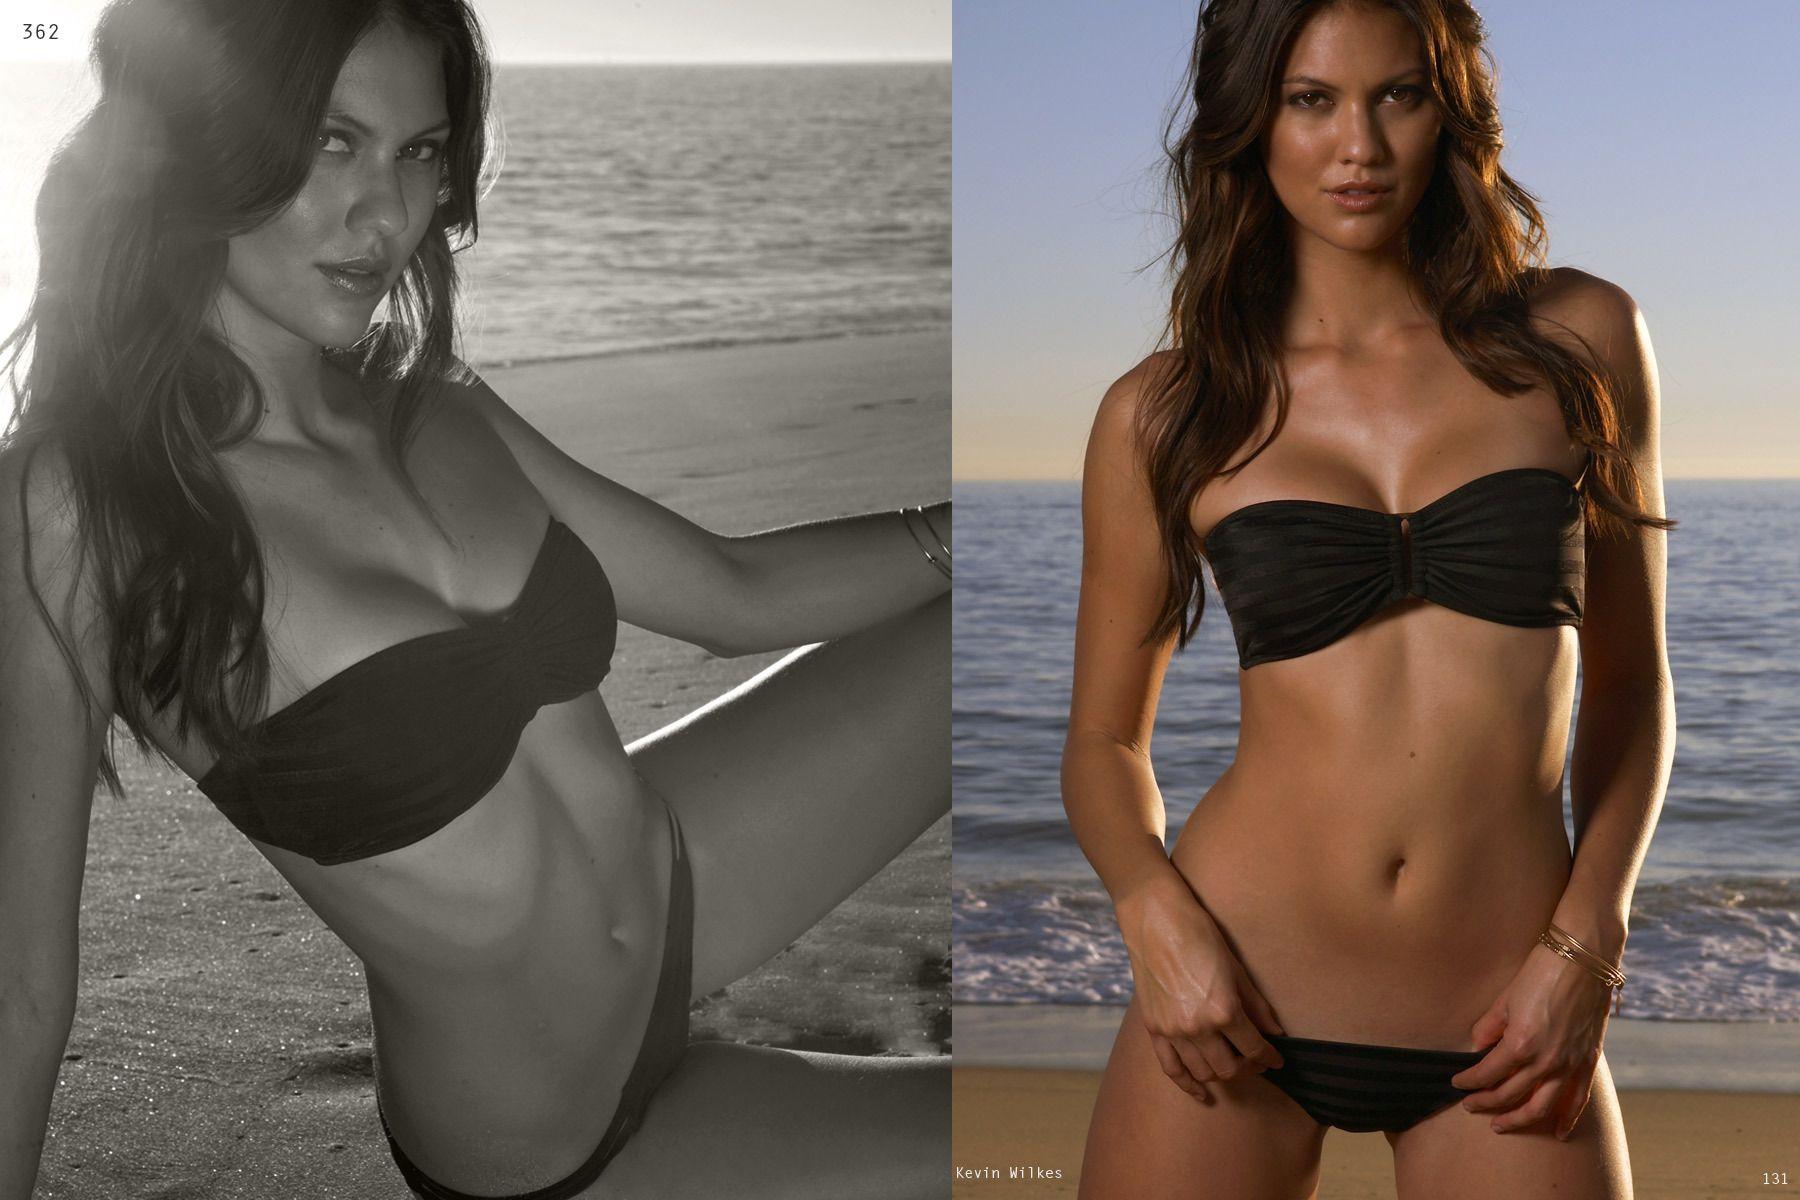 Megan Abrigo. Bikini Tyler Rose. 362 Magazine.